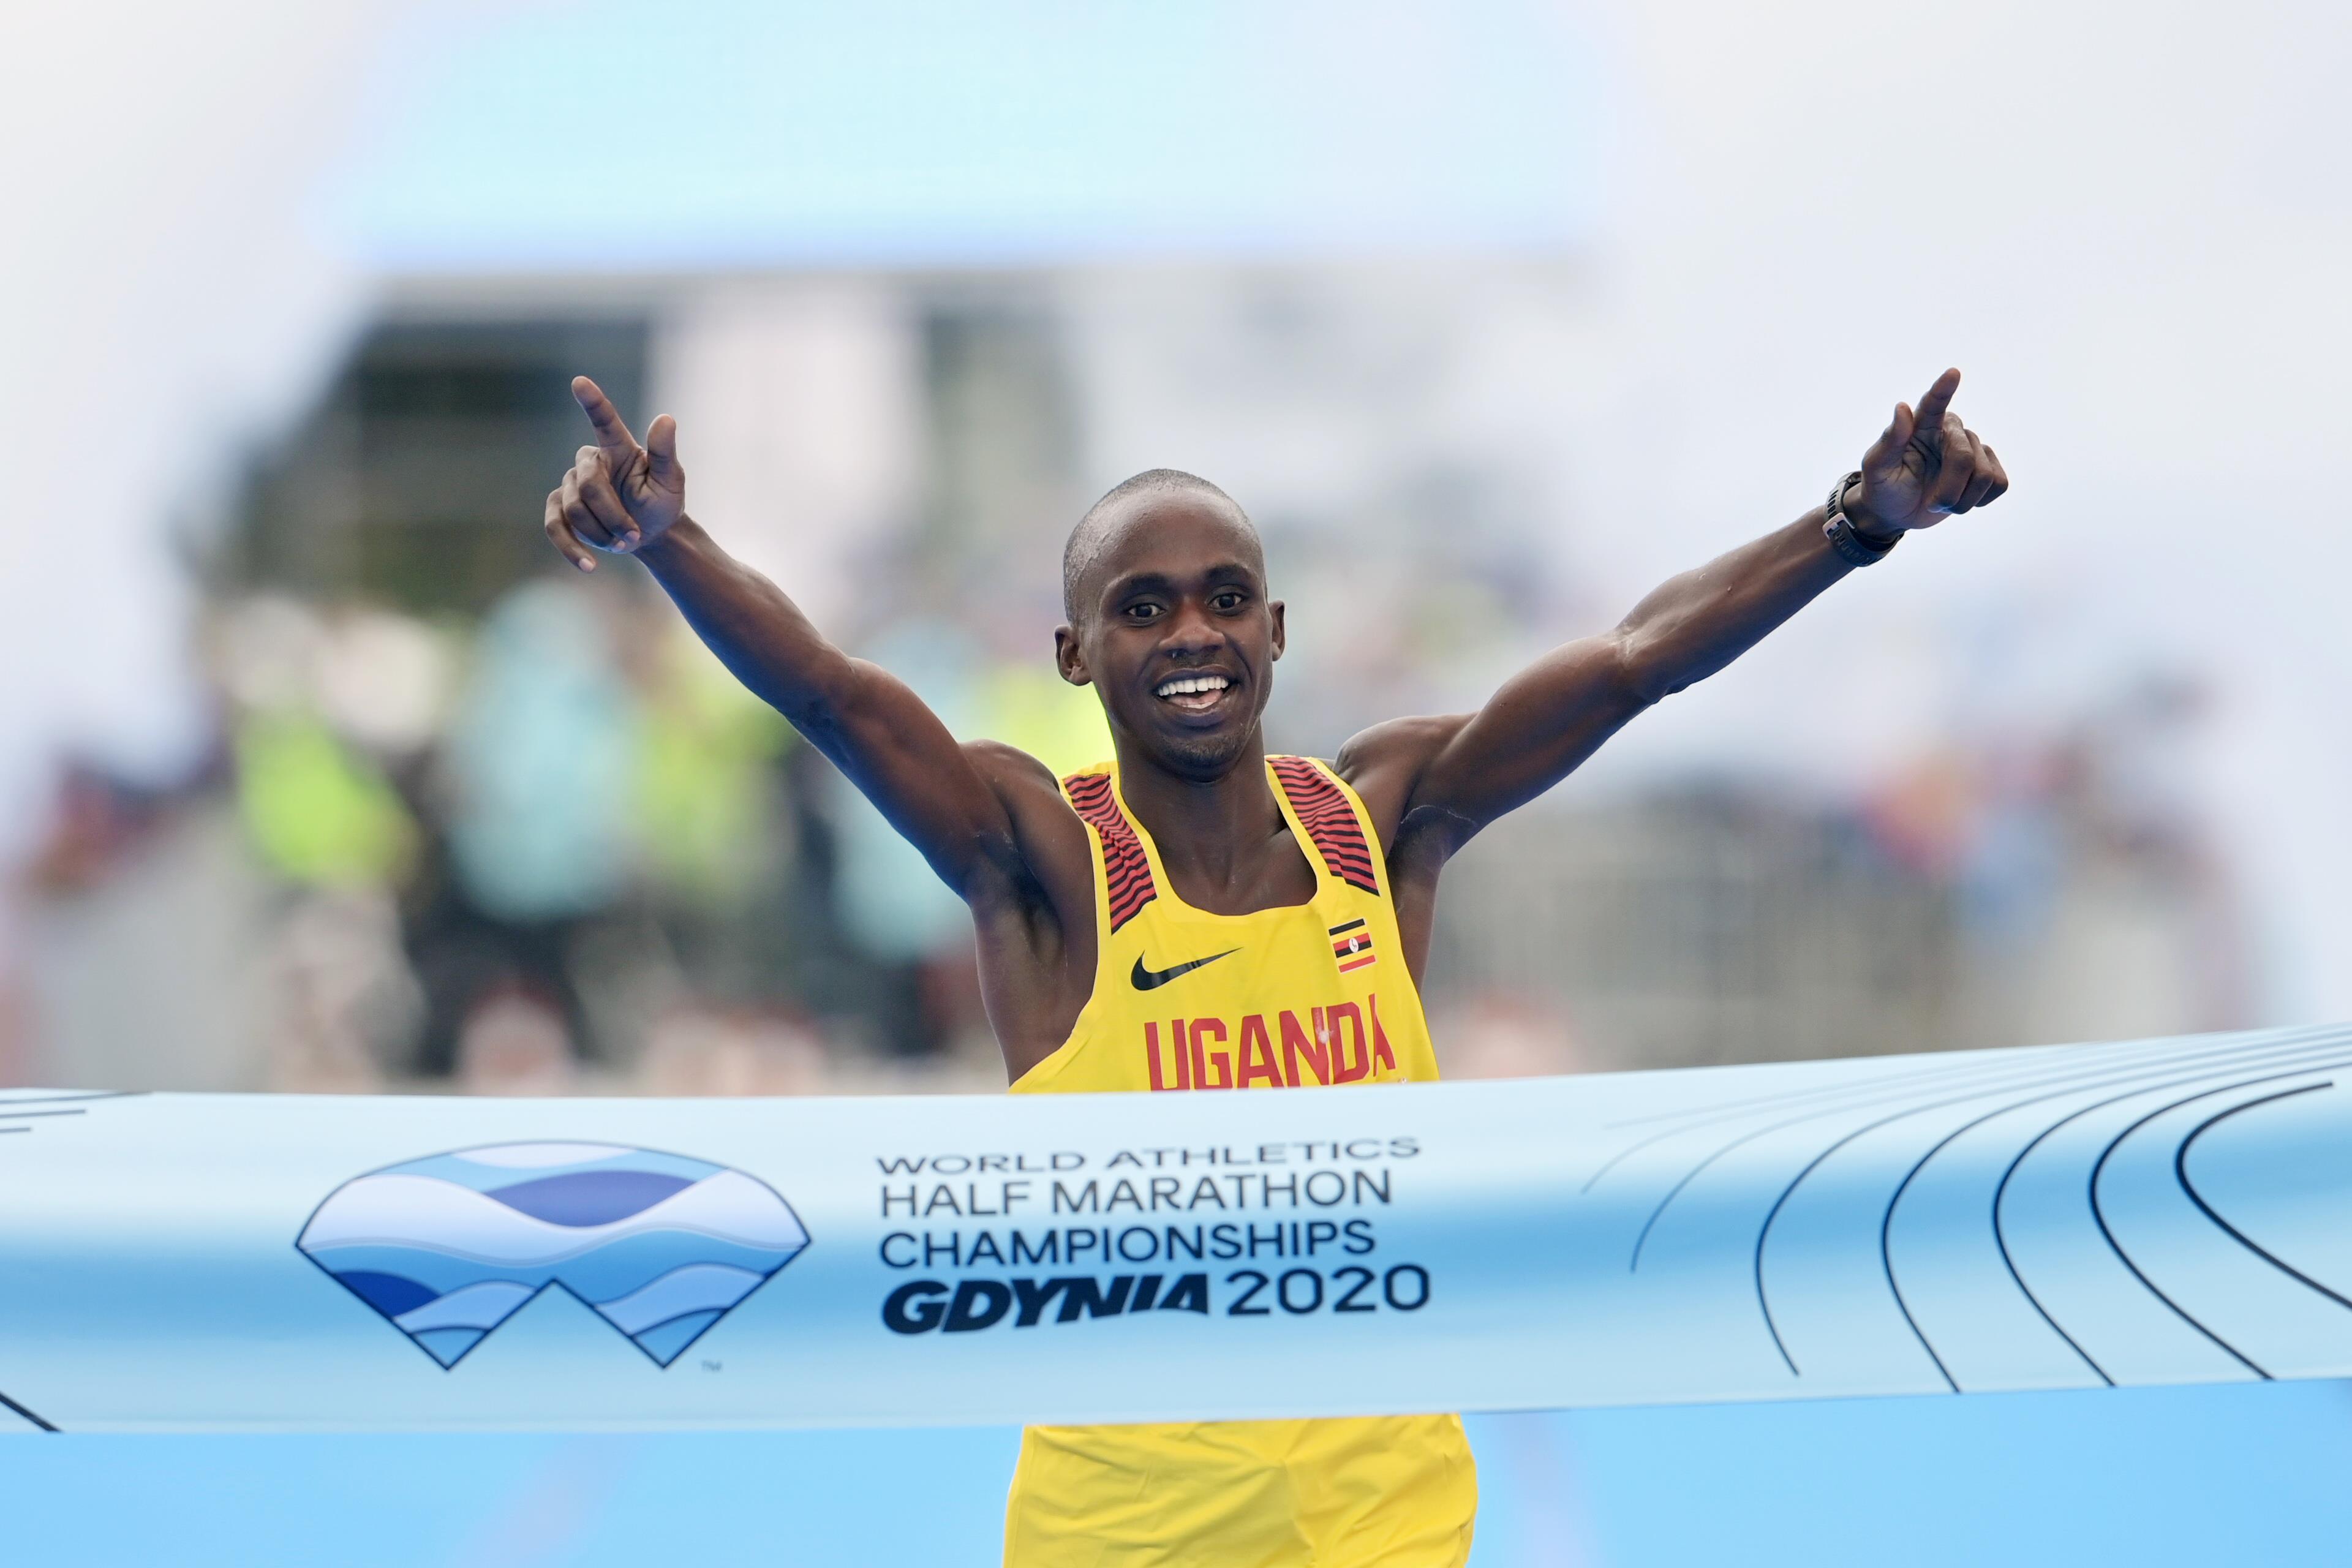 Jacob Kiplimo wins the World Athletics Half Marathon Championships Gdynia 2020 (Getty Images)